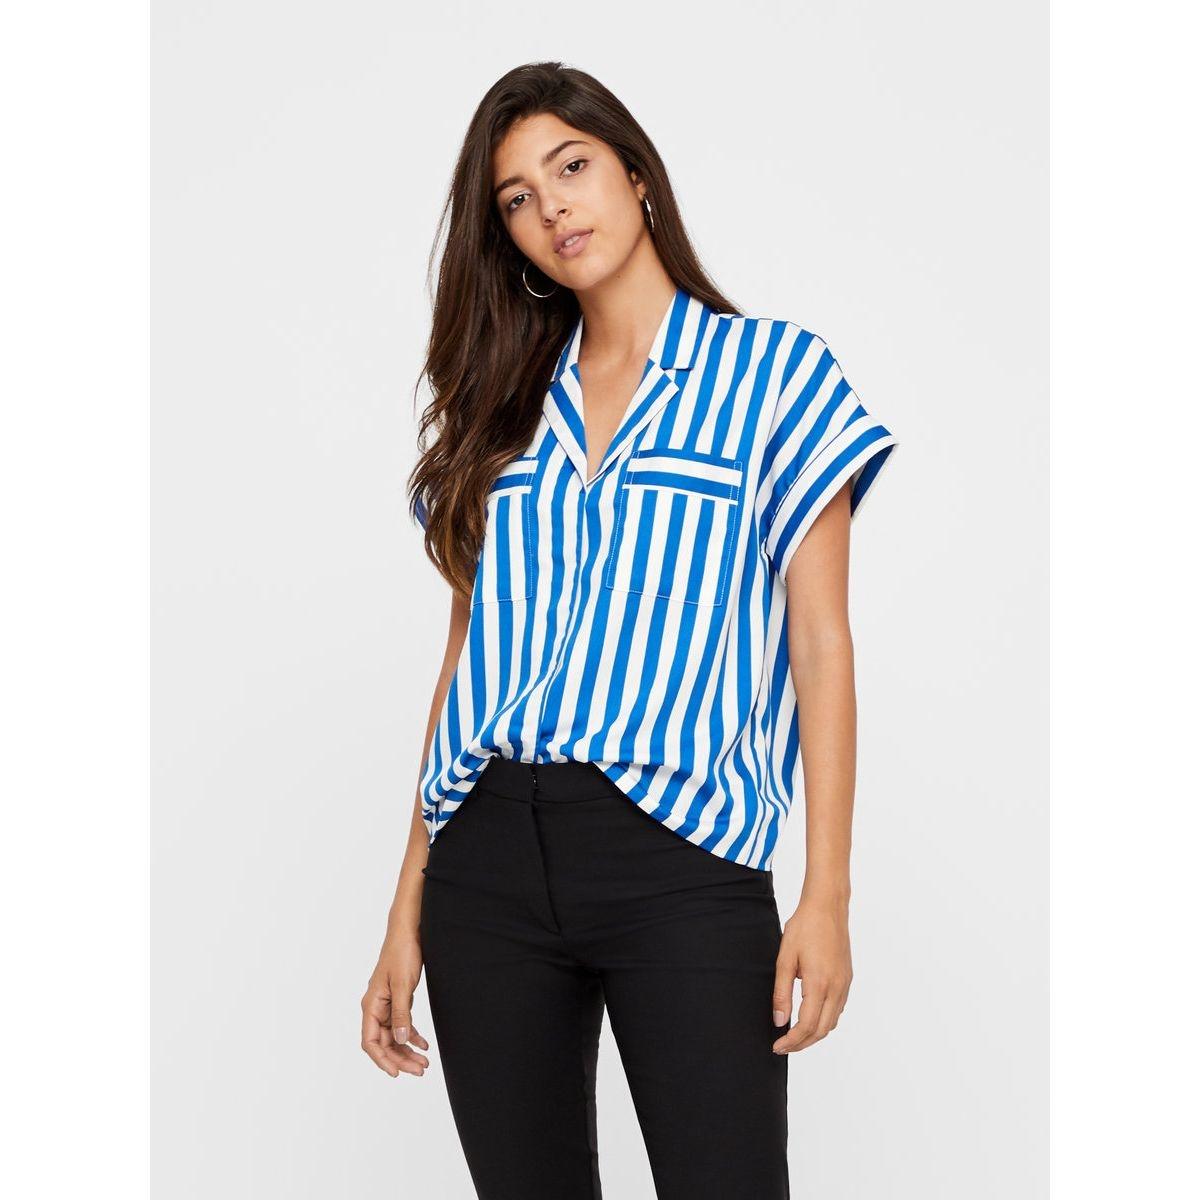 Chemise à manches courtes rayures bleues